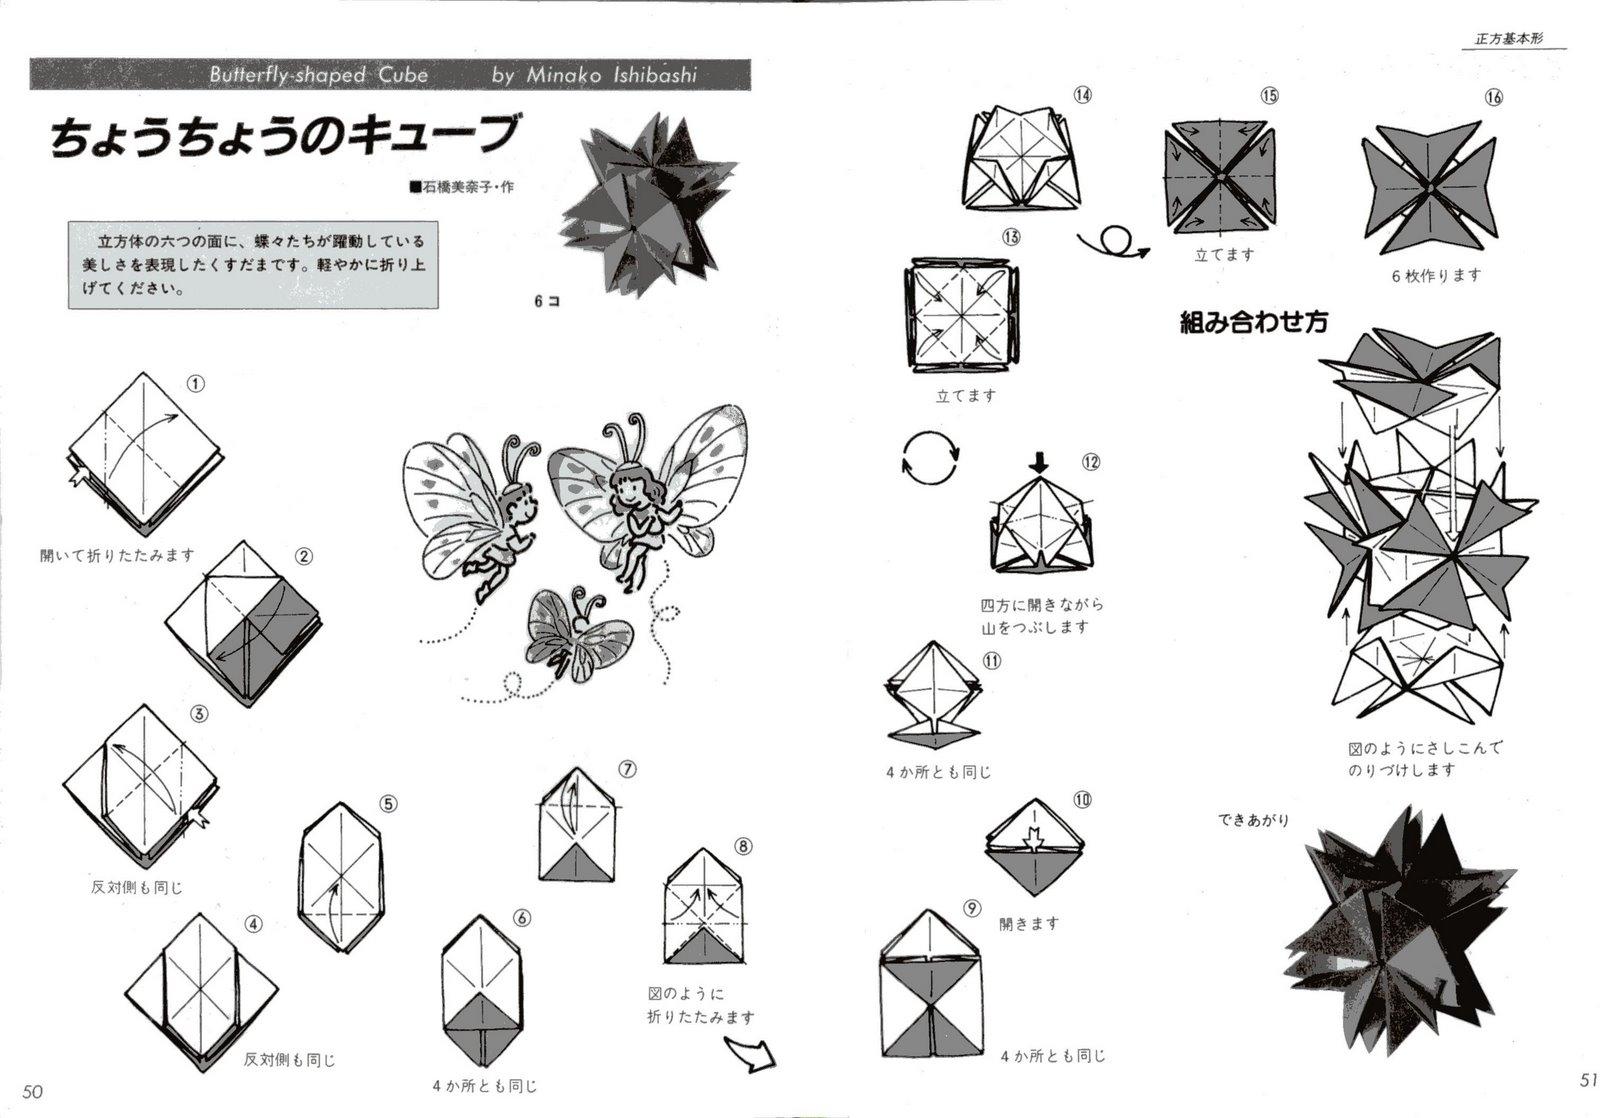 jholanda origami  butterfly cube